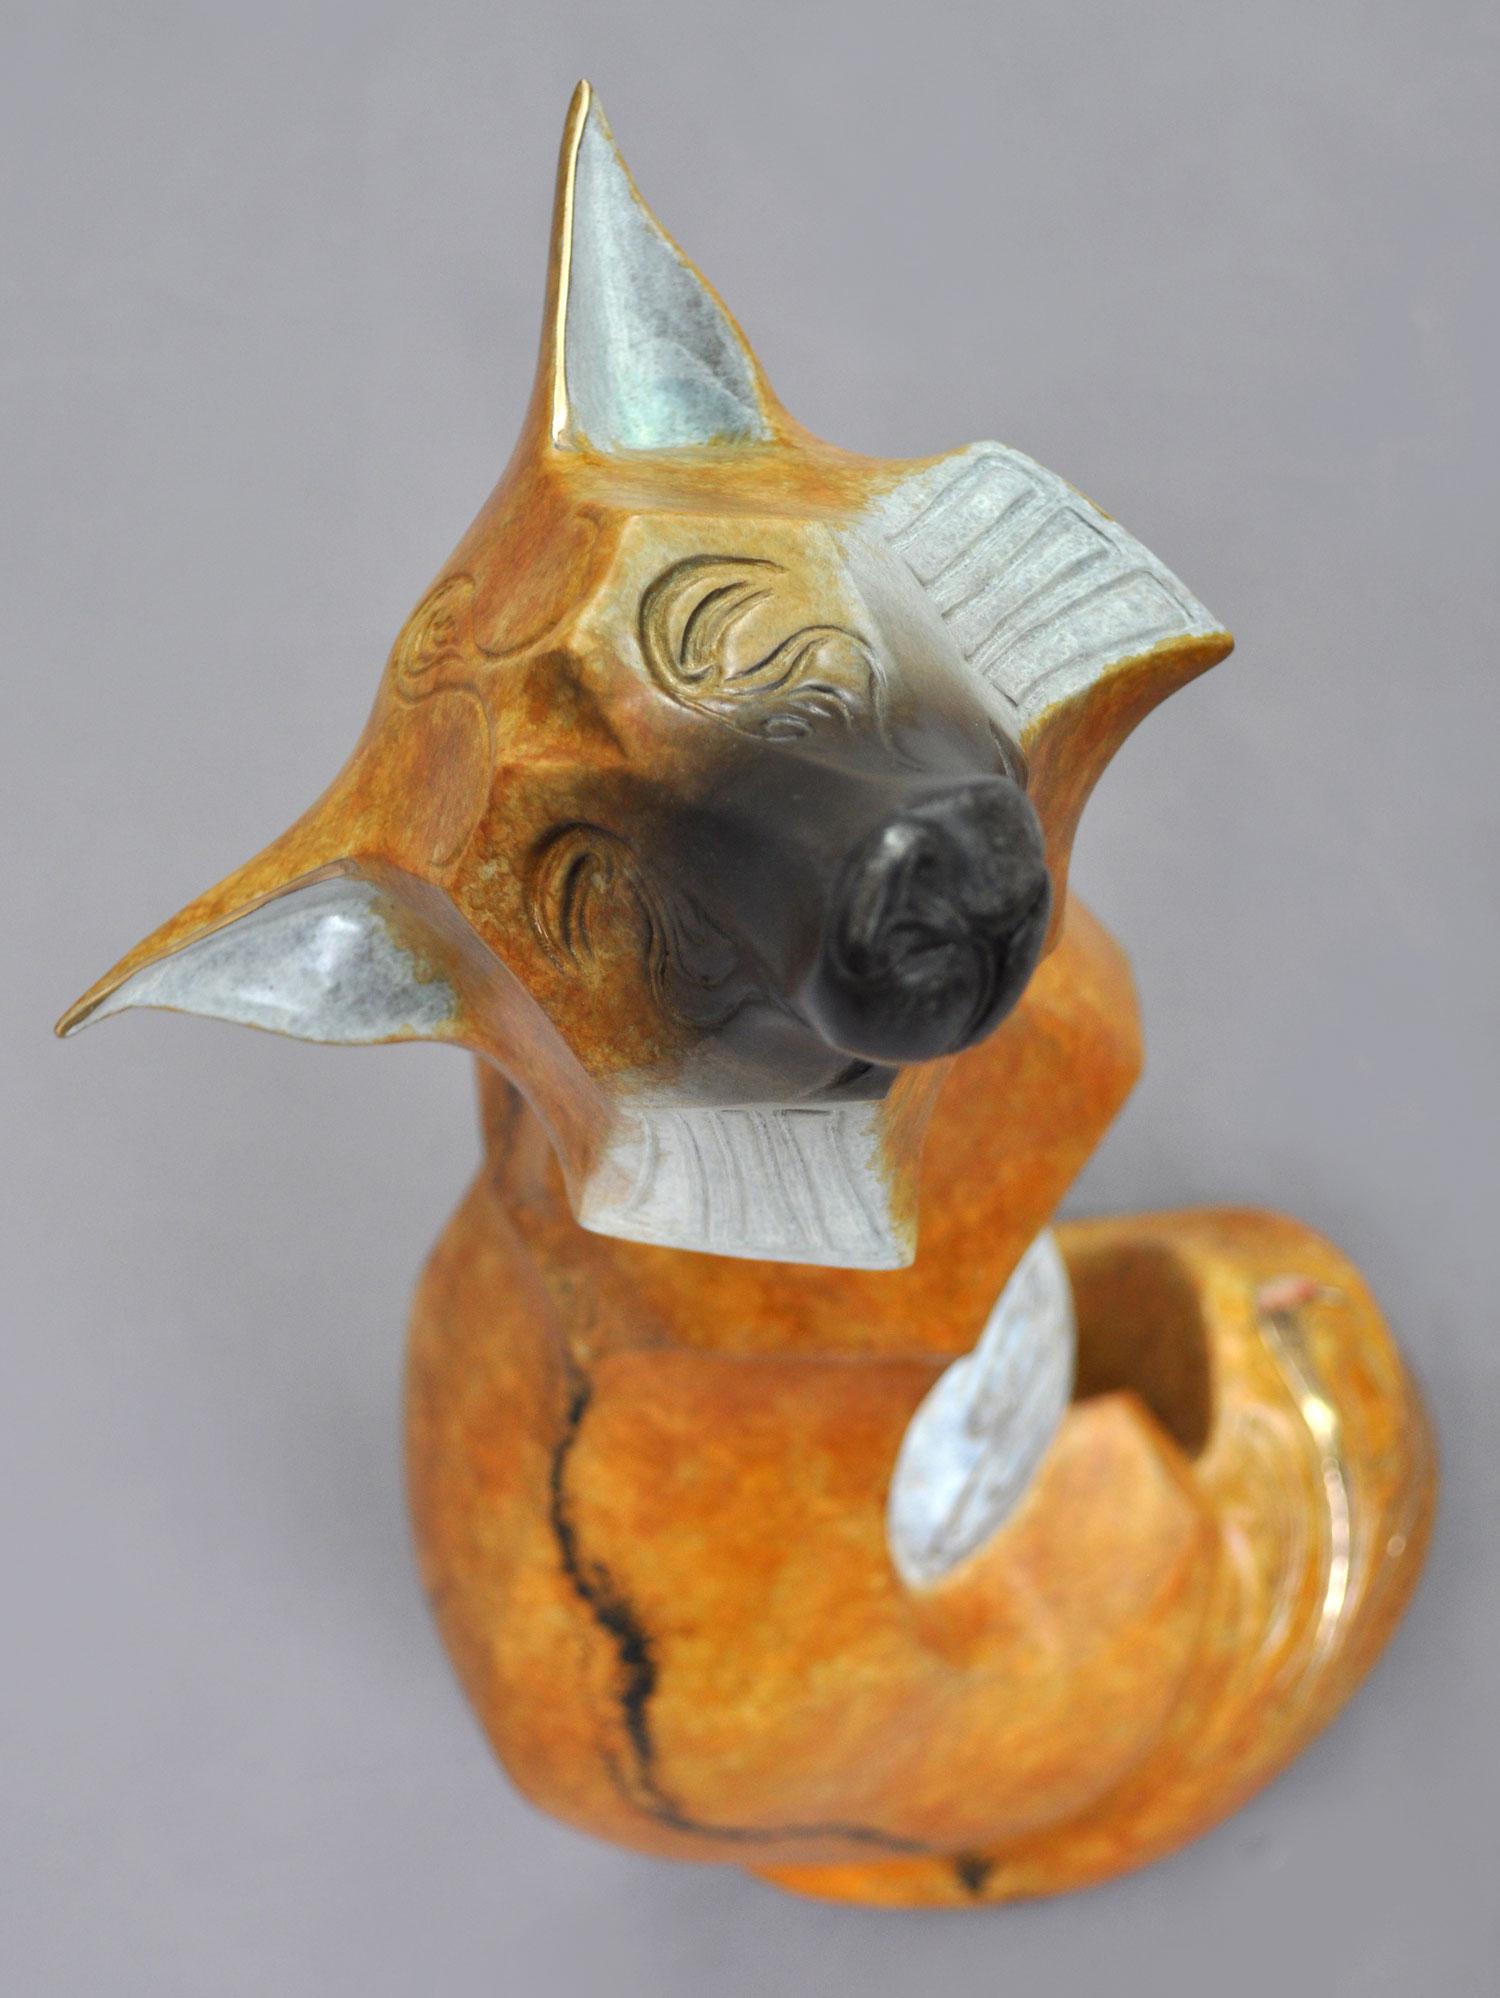 bronze-fox-sculpture-churro-john-maisano-3.jpg